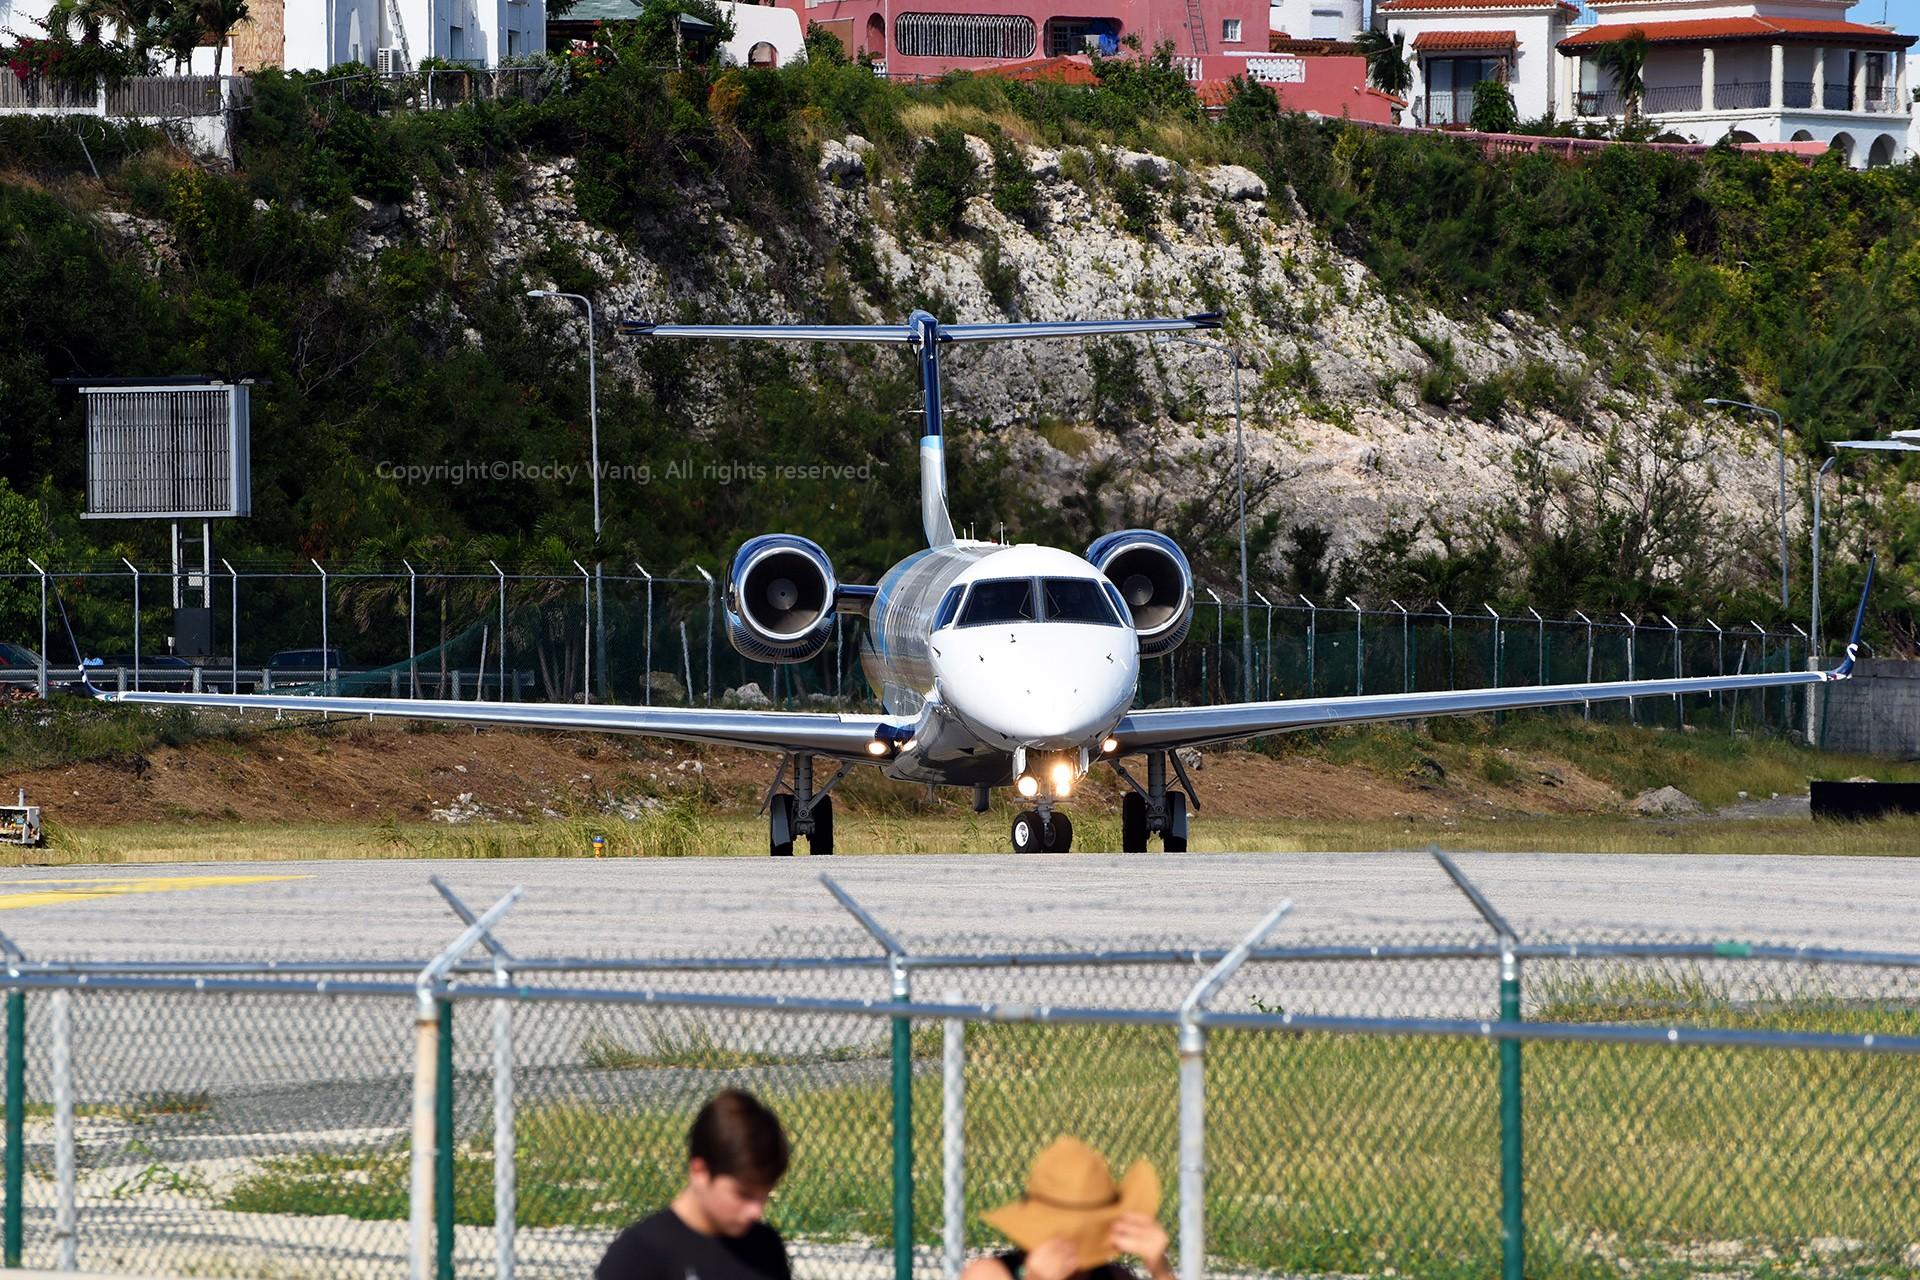 Re:[原创]My endless Caribbean dream——圣马丁朱莉安娜公主机场拍机记 EMBRAER ERJ-135BJ LEGACY 600 N515JT 荷属安的列斯群岛朱利安娜公主机场